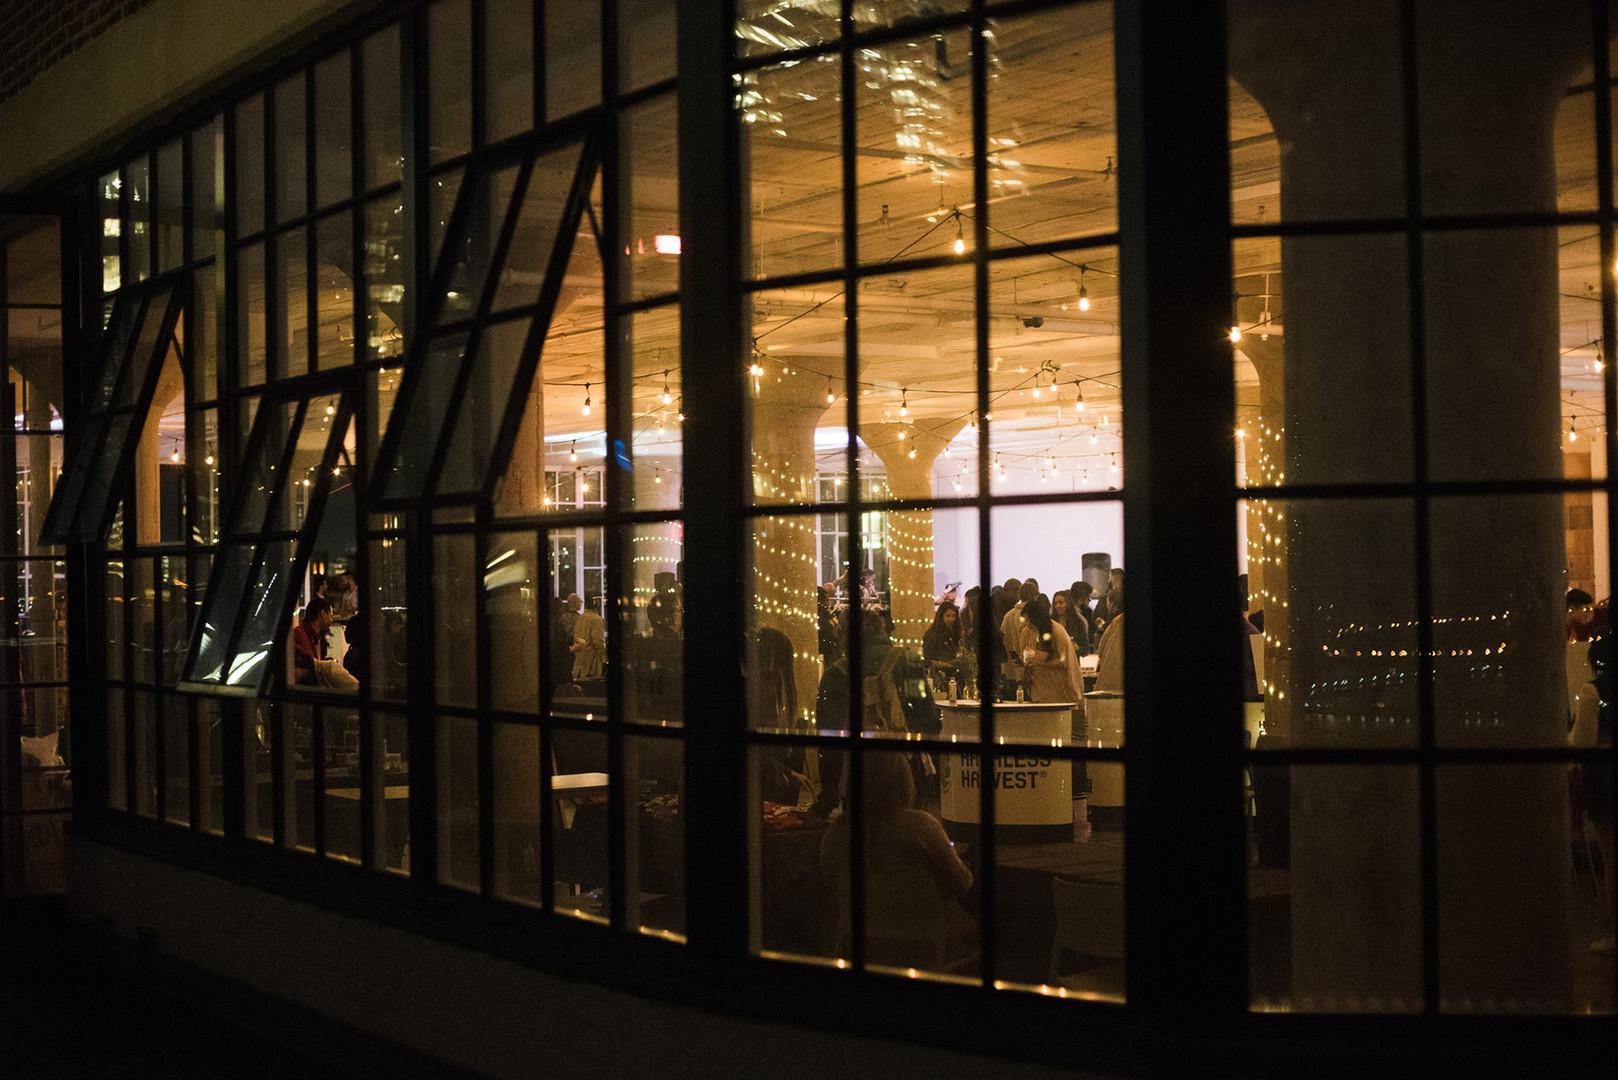 Marketplace of the Future Starrett Lehigh External Photo